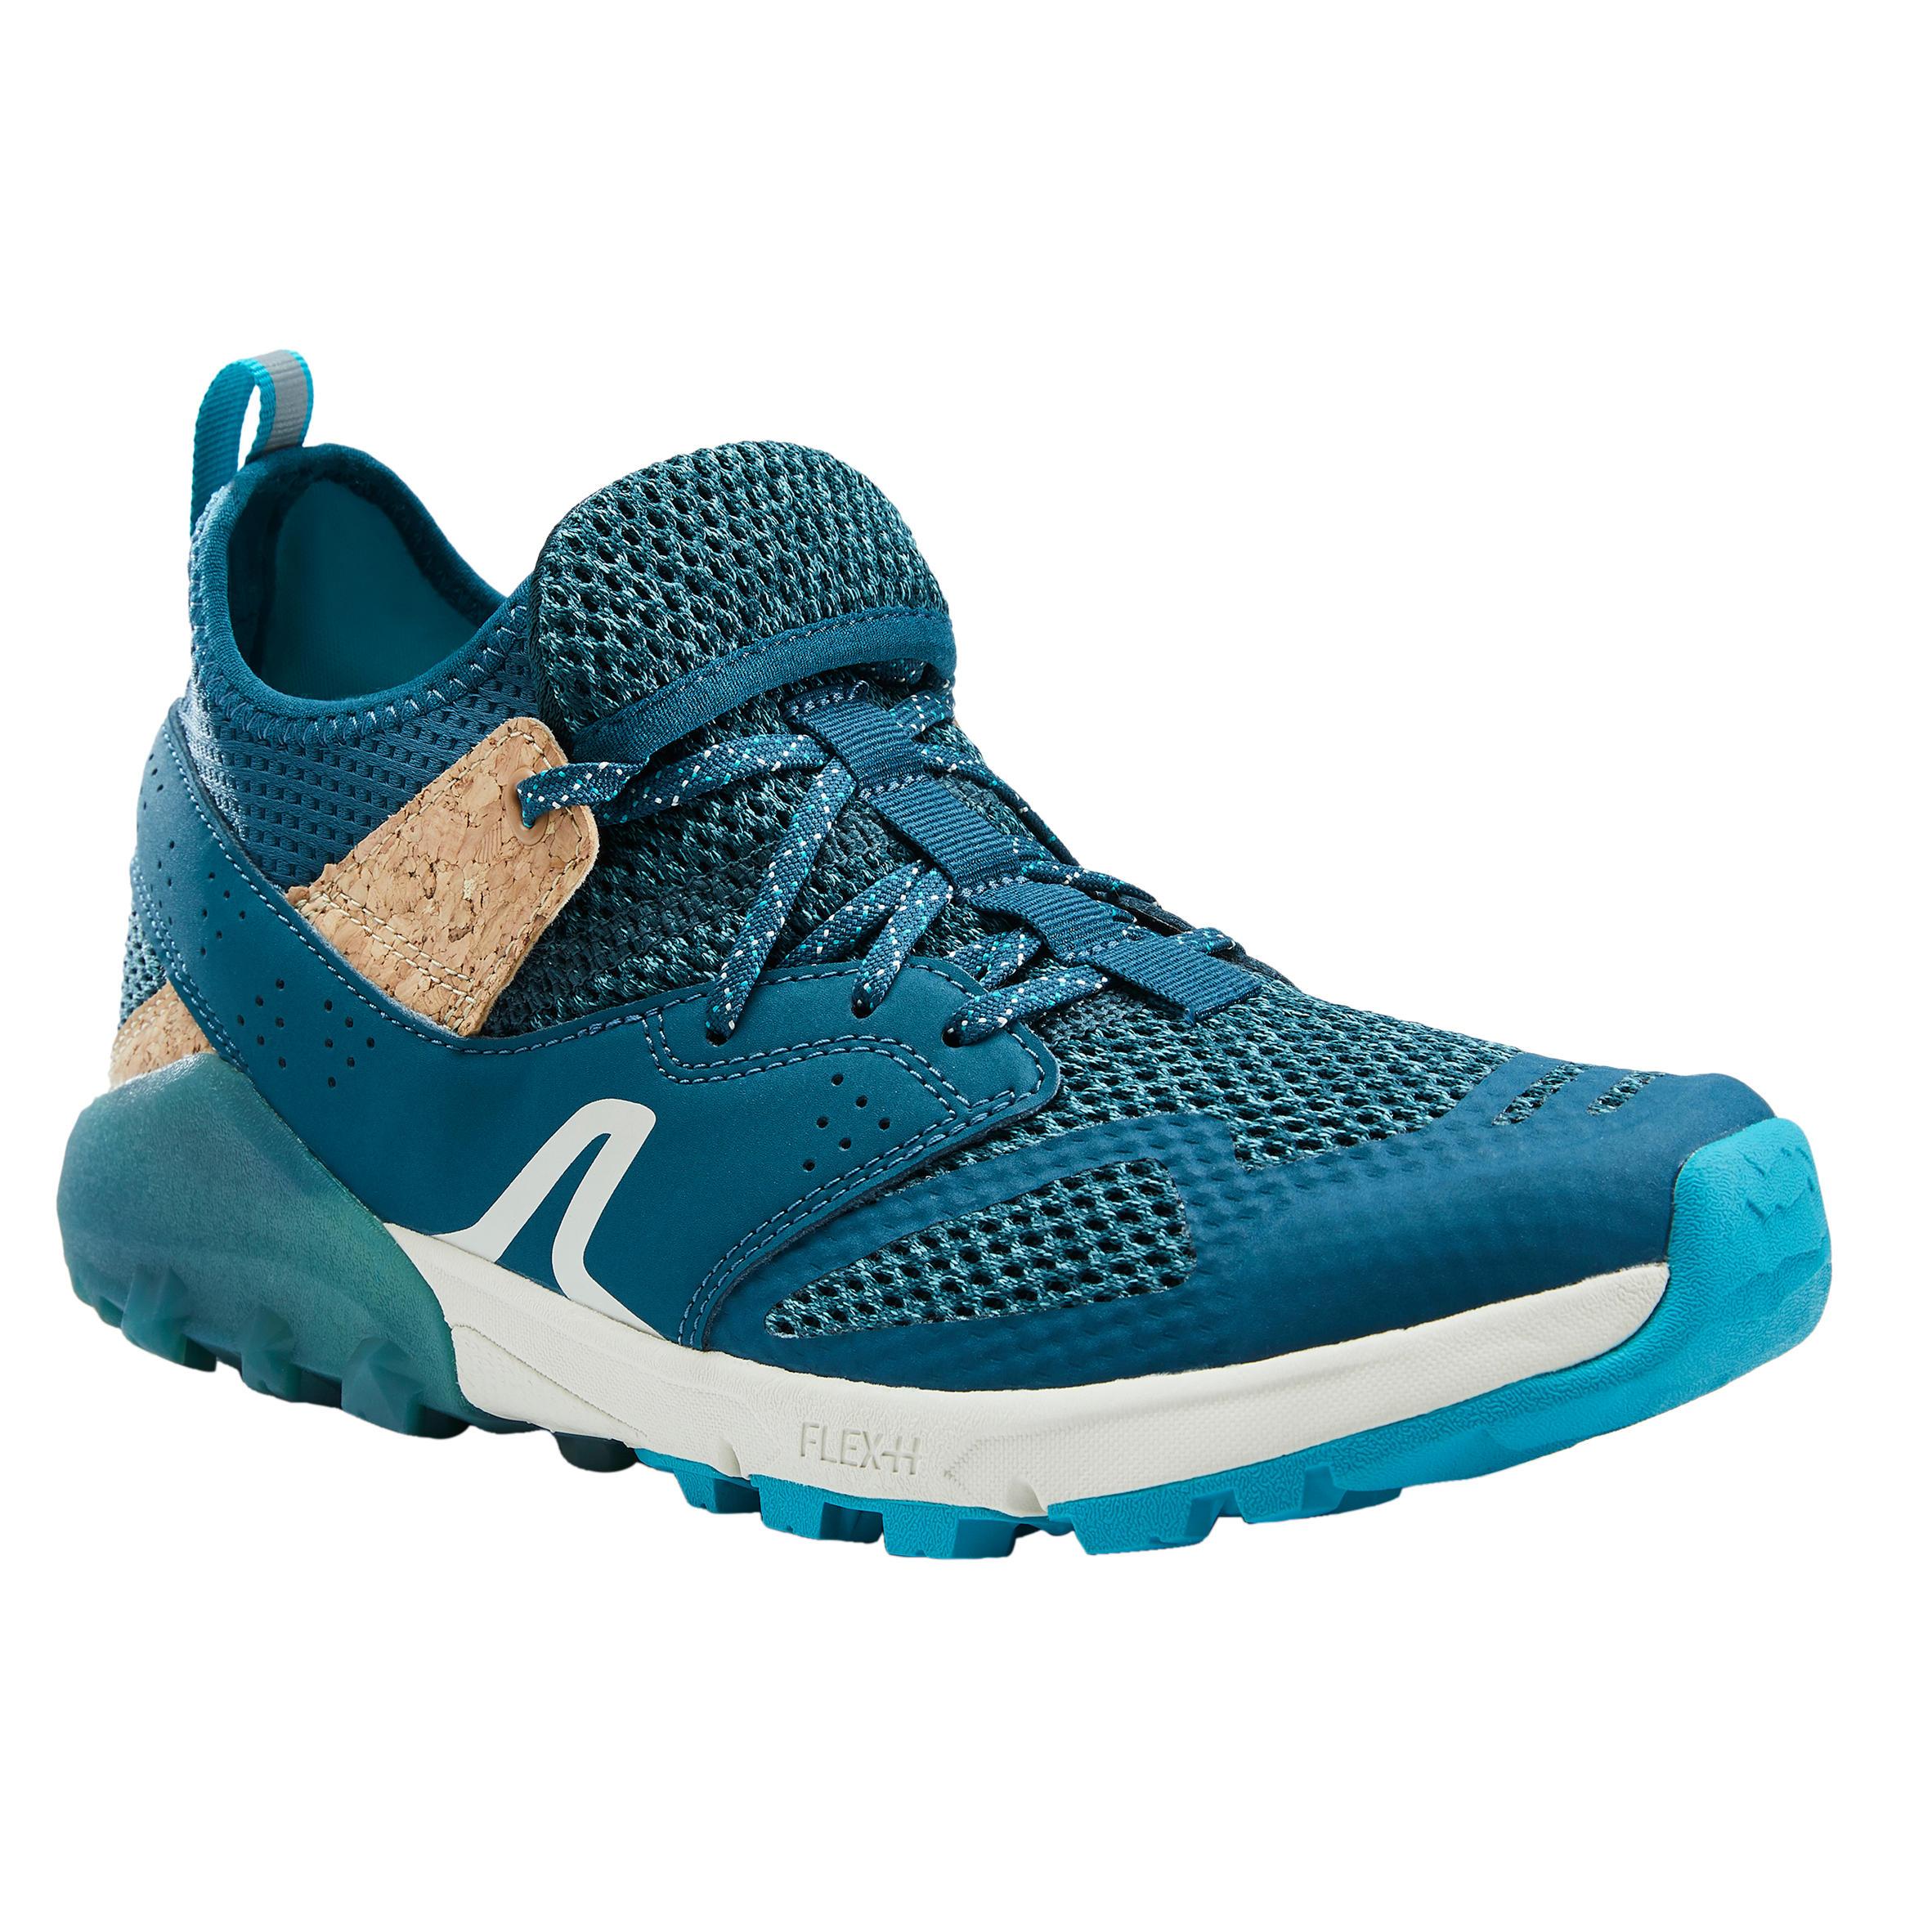 NordicWalkingschuhe NW500 FlexH | Schuhe > Sportschuhe > Walkingschuhe | Newfeel